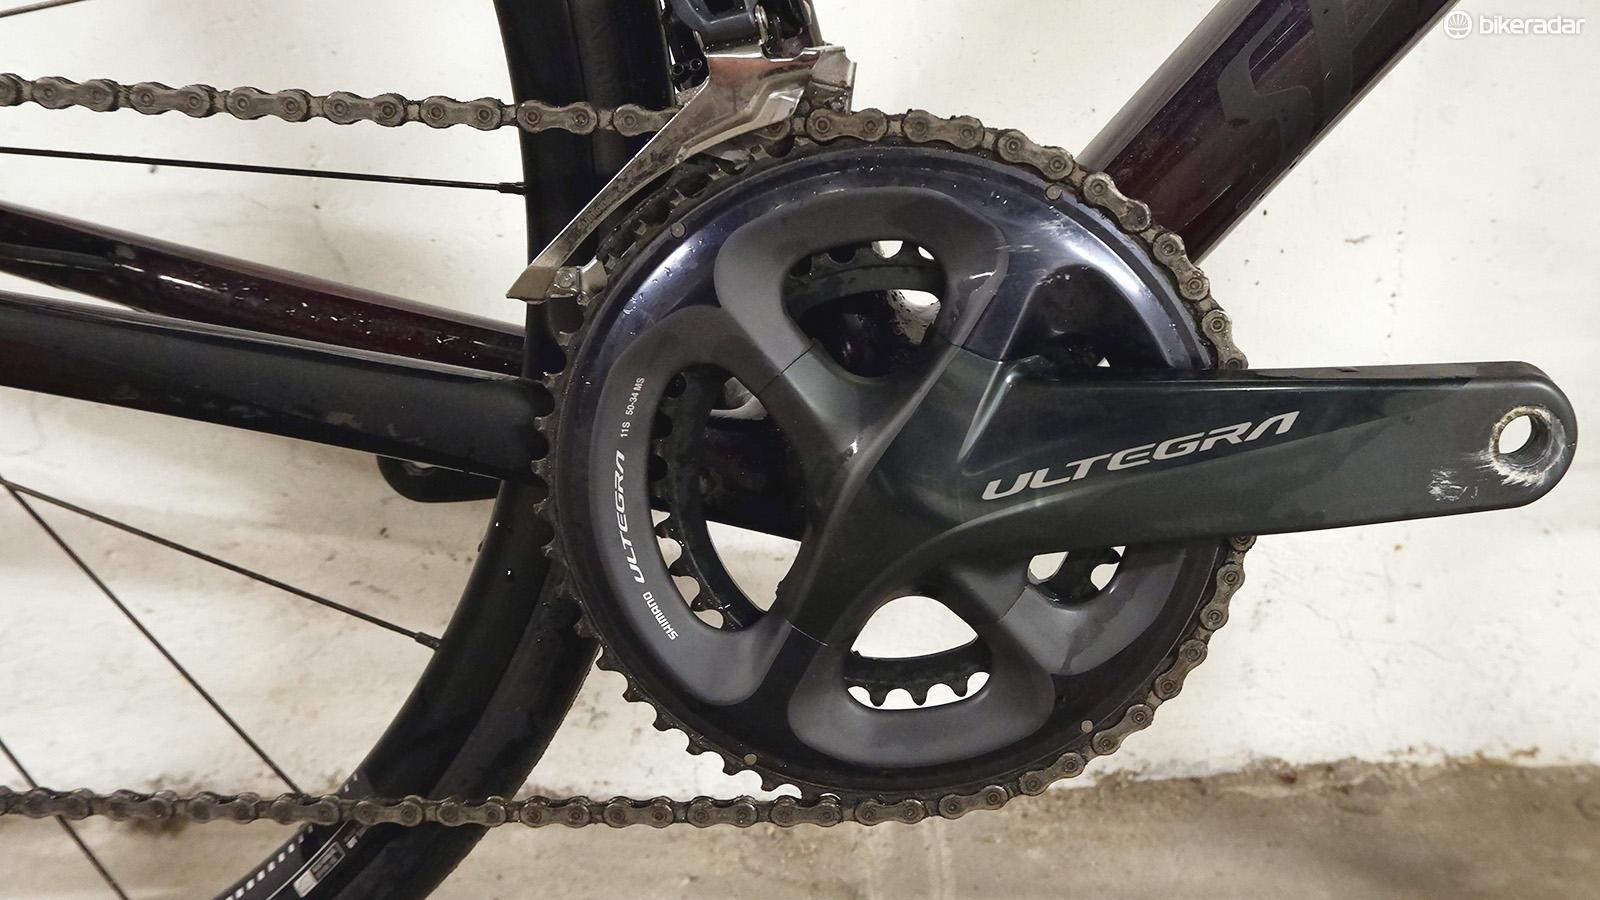 a2d81dfaf43 Specialized Women's Tarmac Disc Comp review - BikeRadar